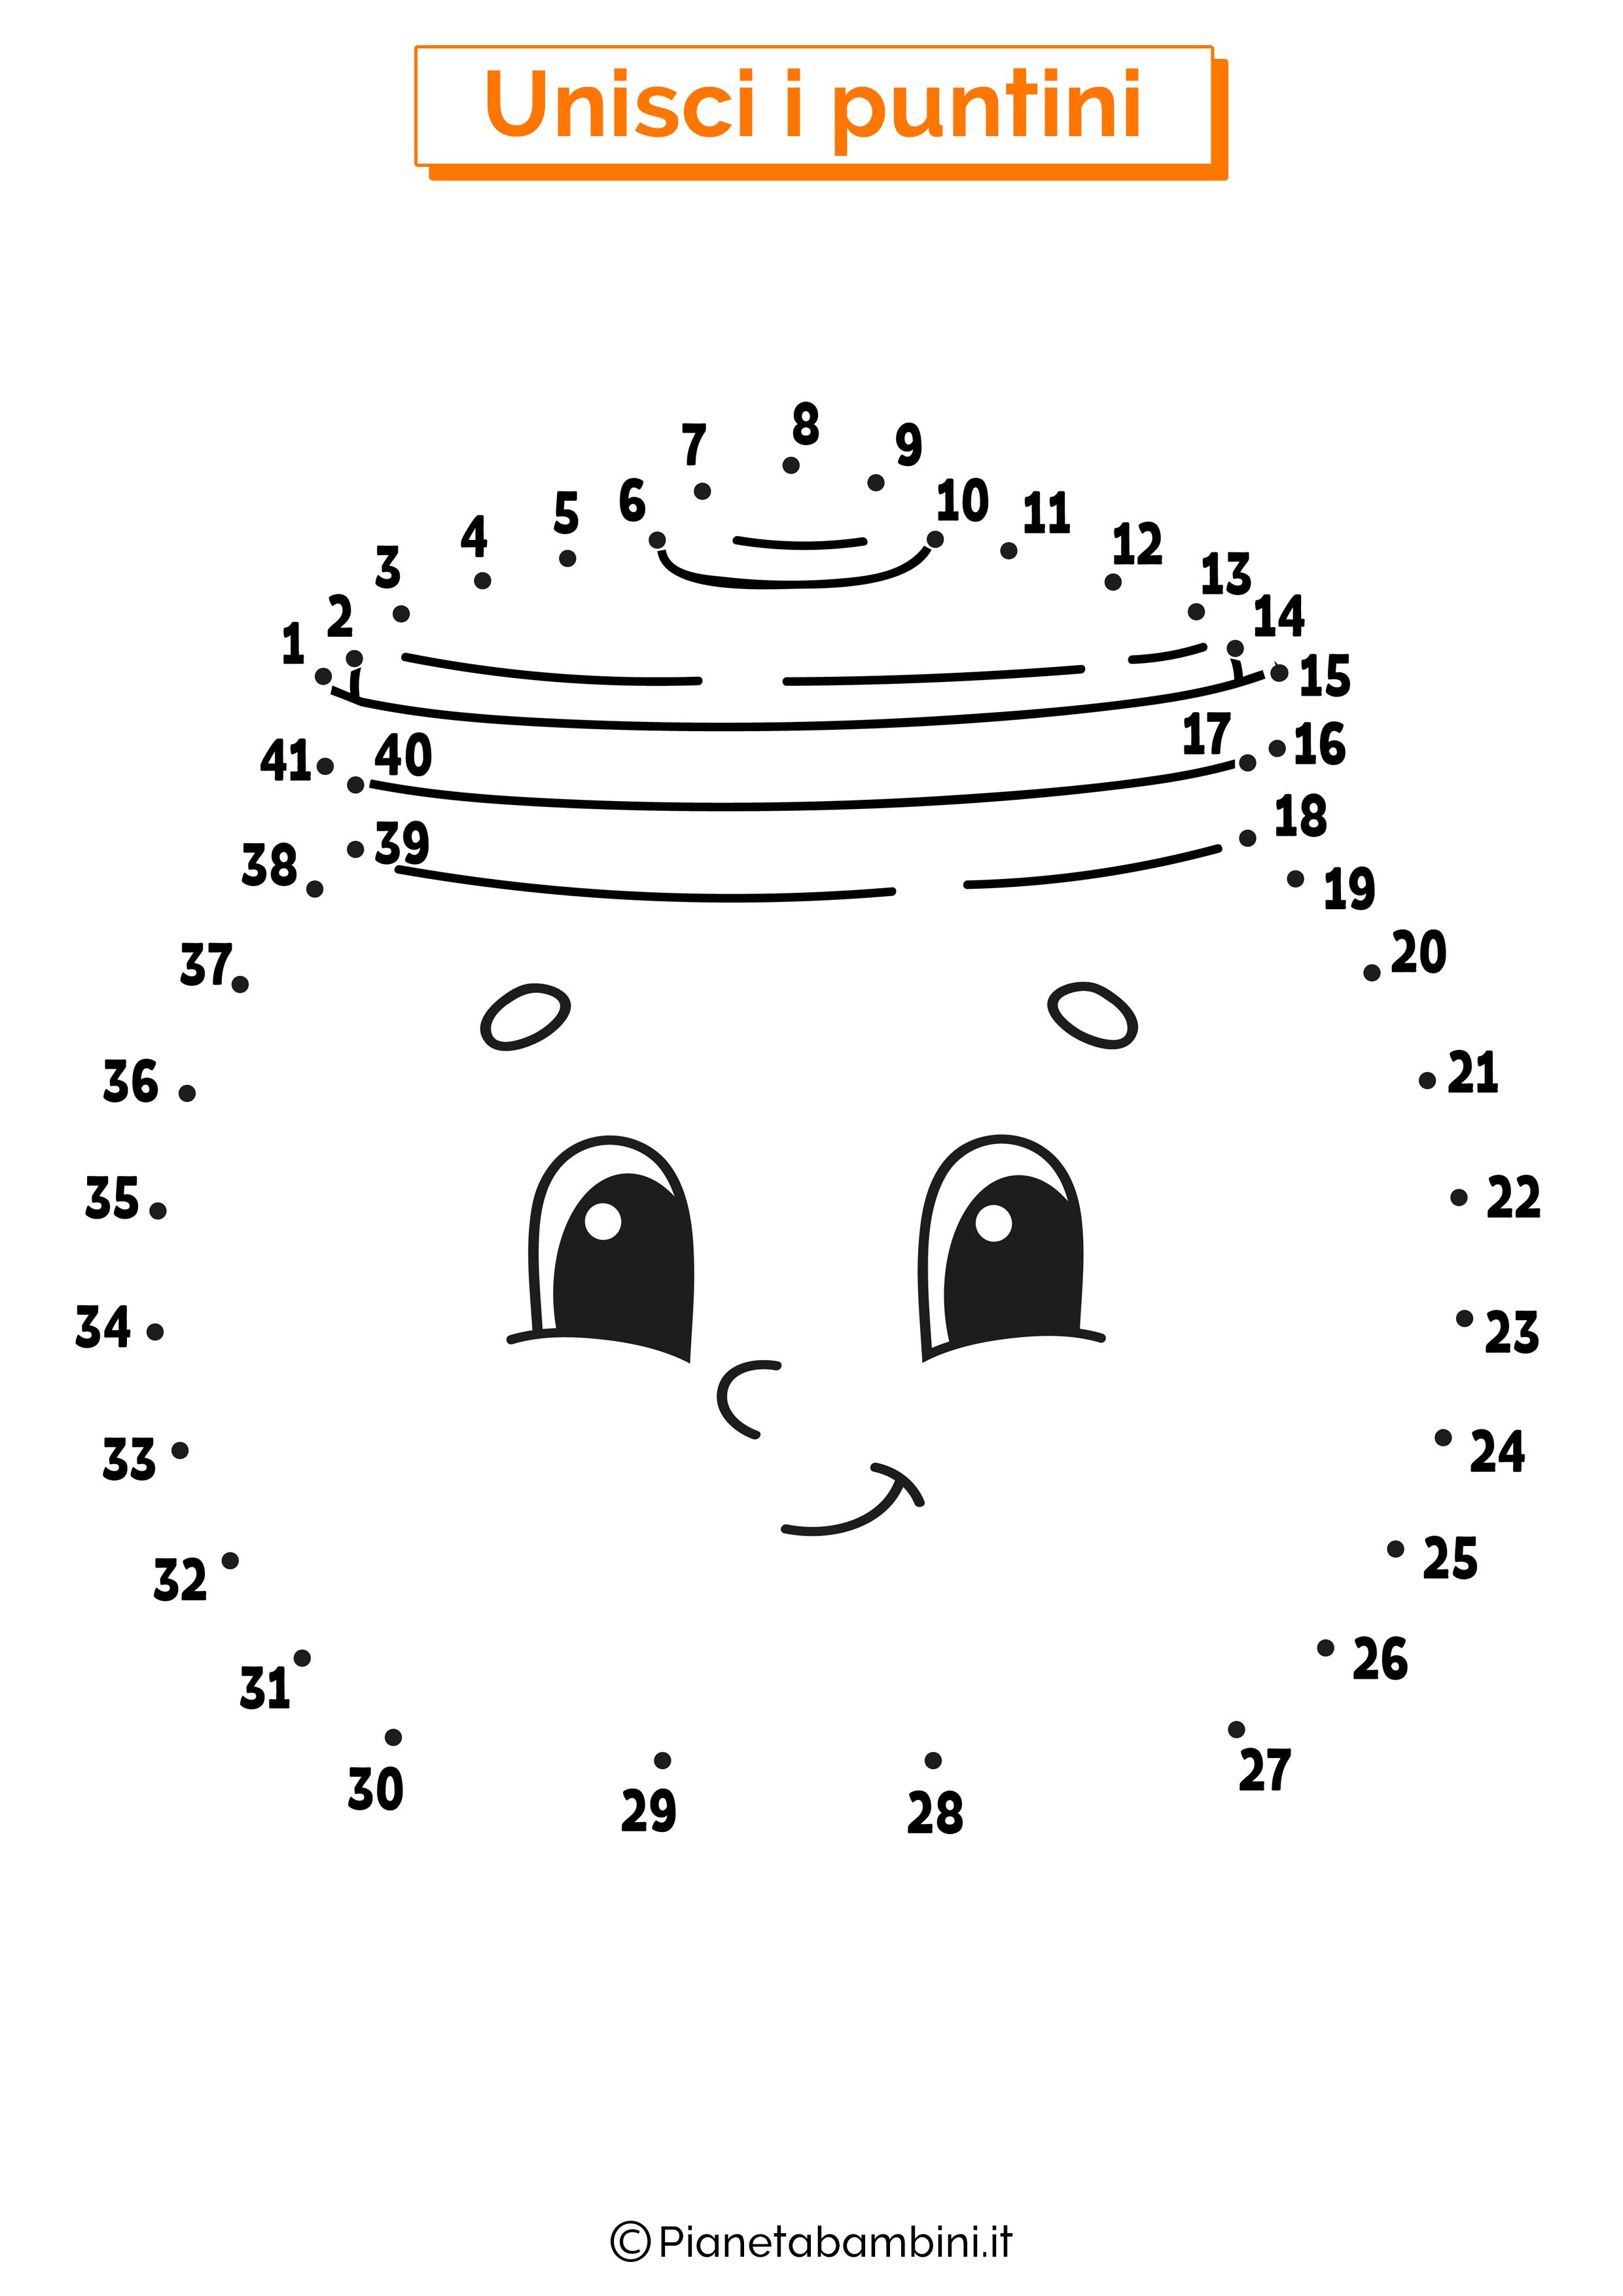 Disegno unisci i puntini 1-40 barattolo